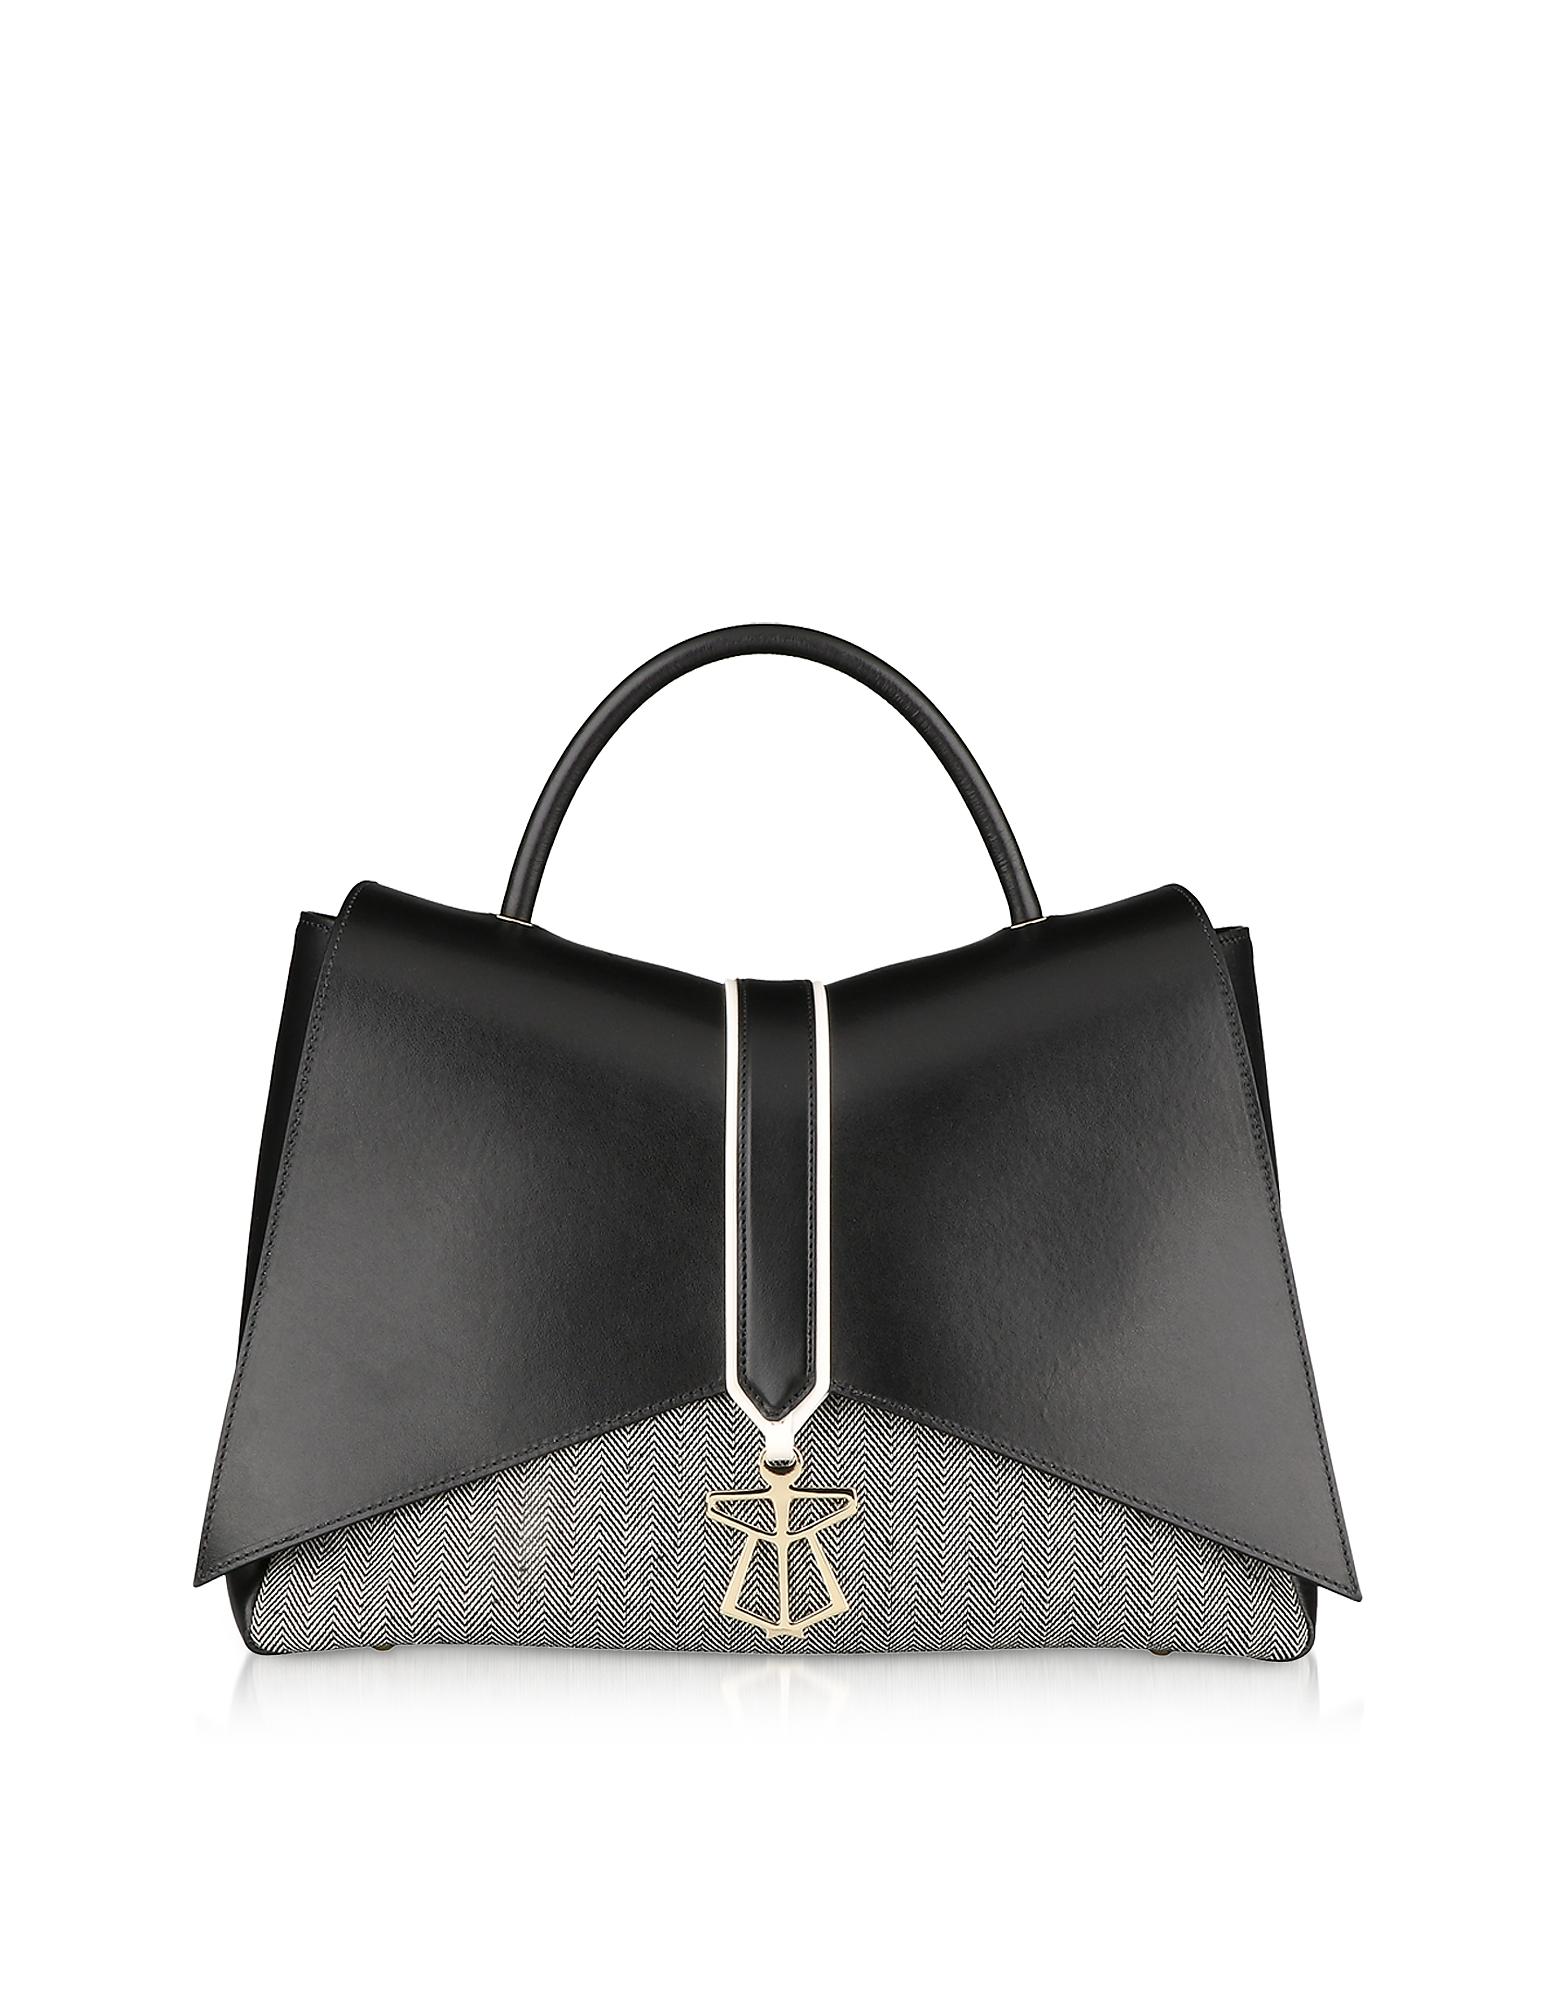 Lara Bellini Designer Handbags, Black Canvas Kiki Top Handle Satchel Bag